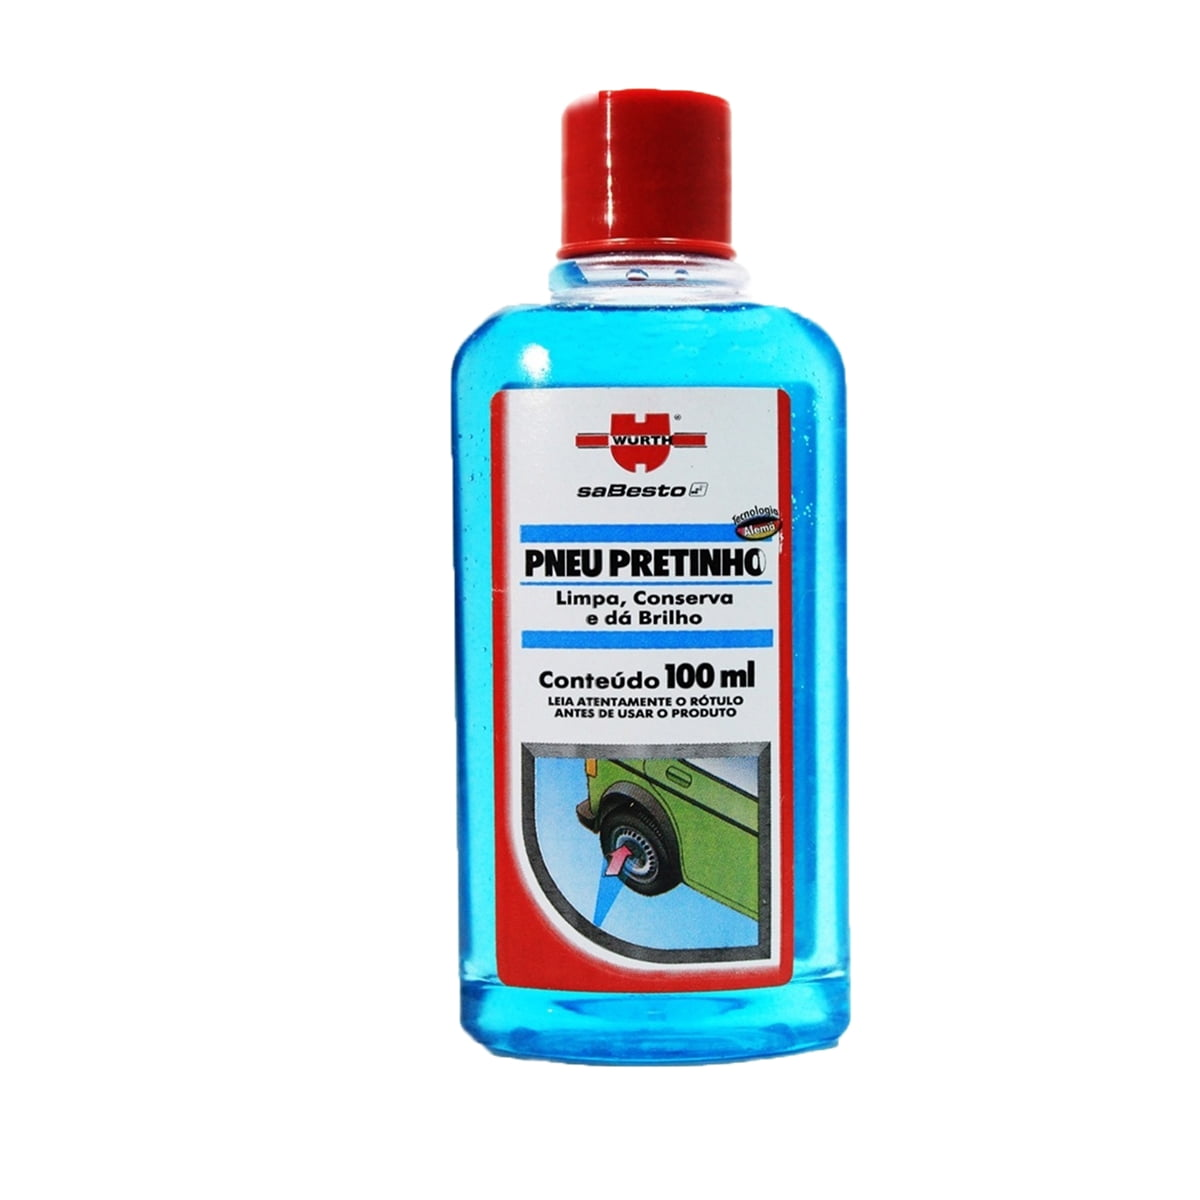 Limpeza Automotiva Pneu Pretinho Liquido 100ML em até 6x sem juros